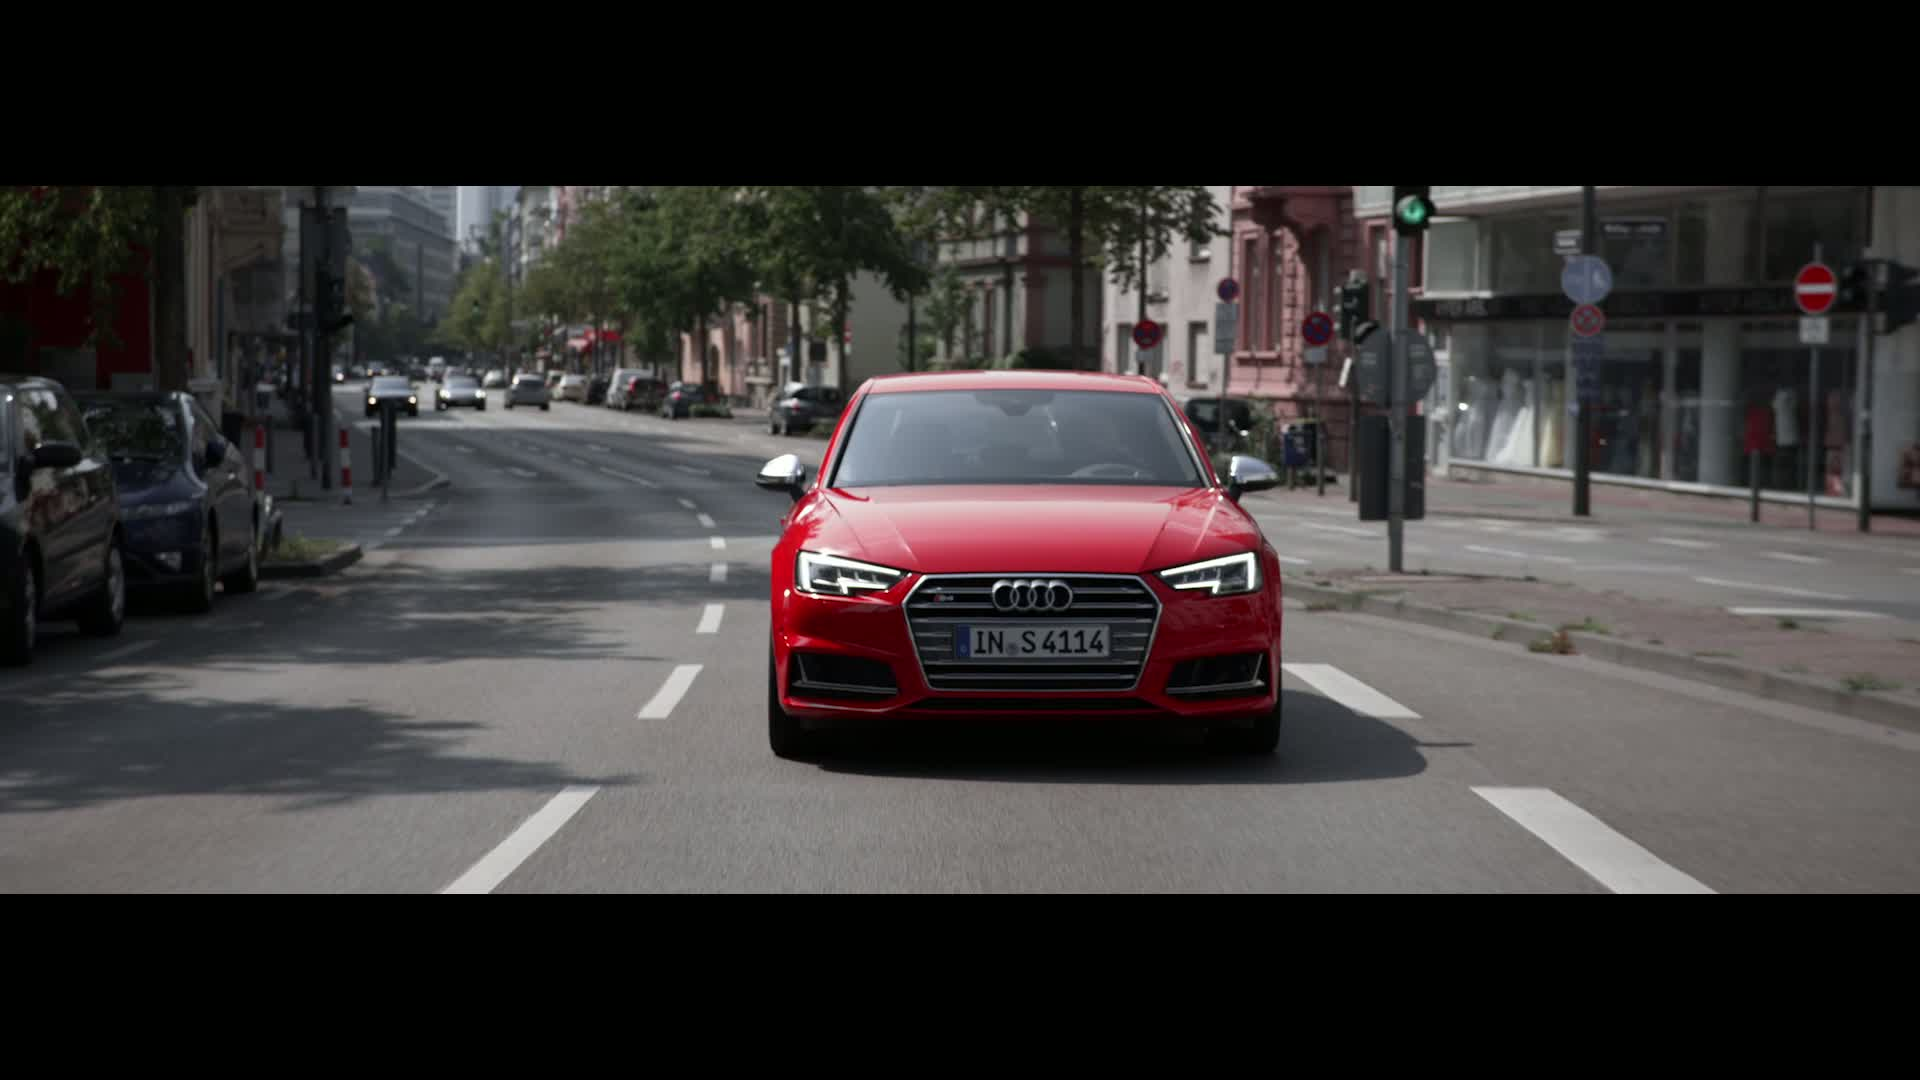 Audi S4 - Trailer